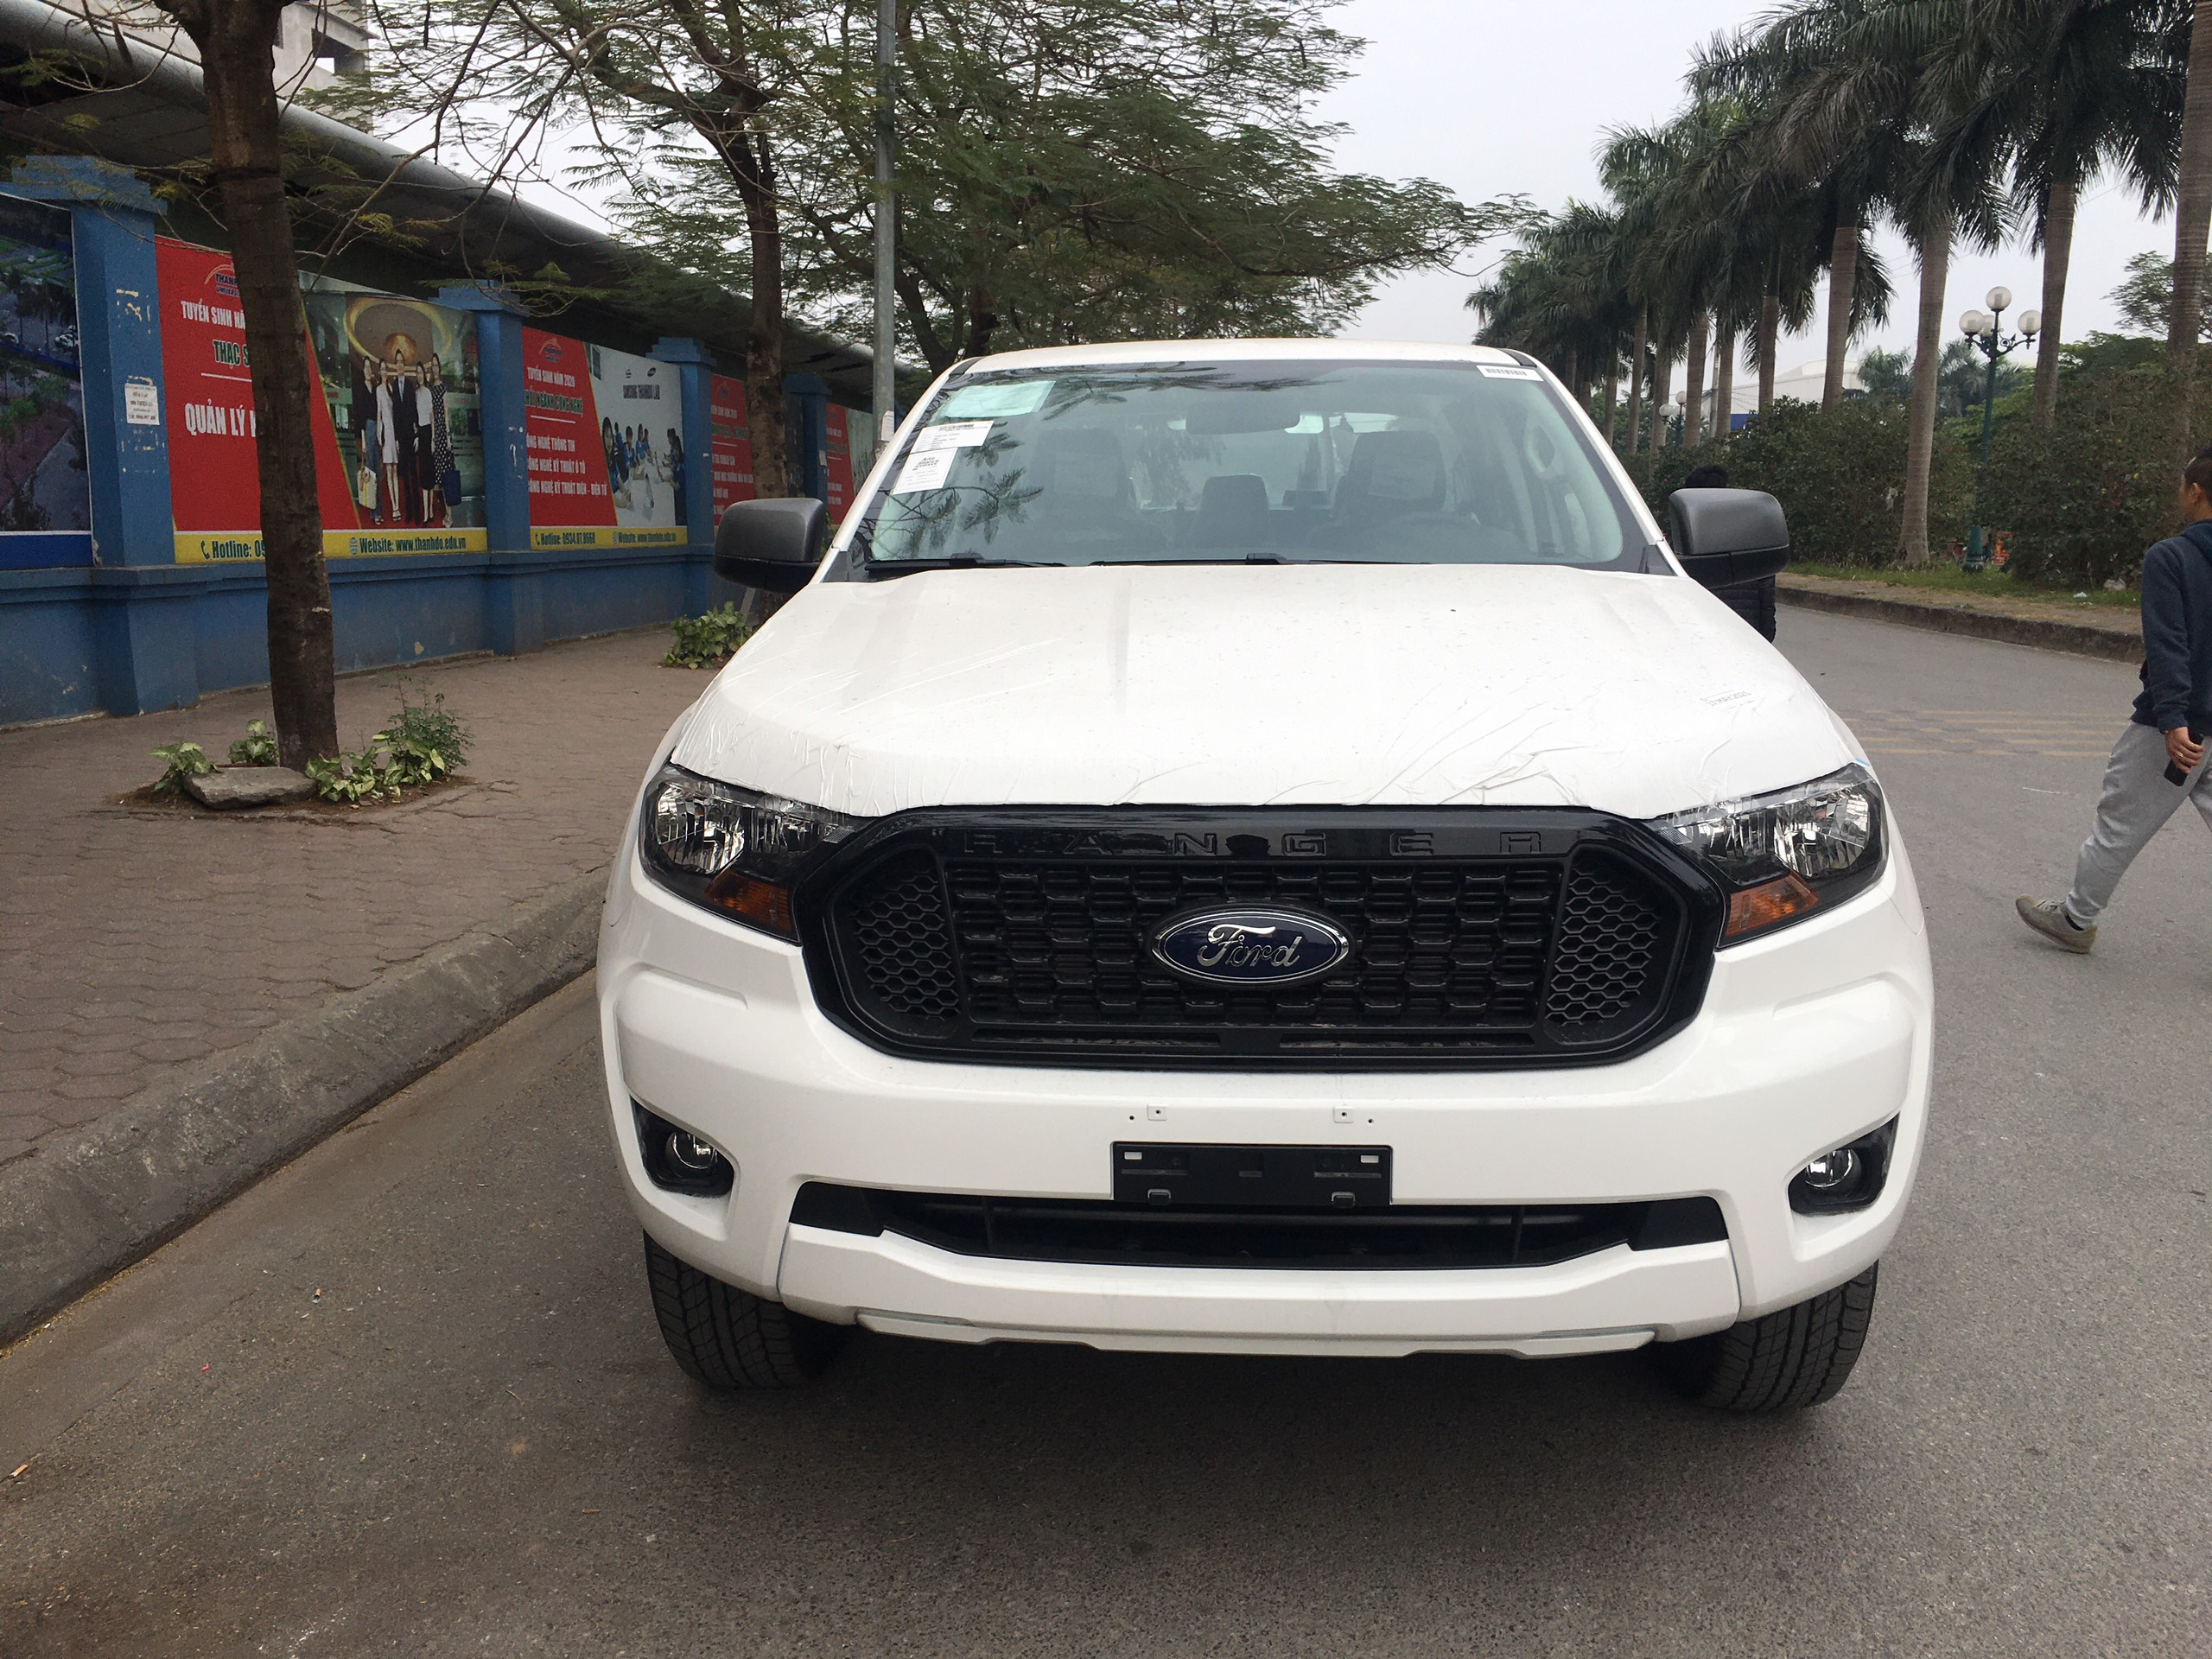 Ford Ranger XLS 2.2L 4×2 AT2